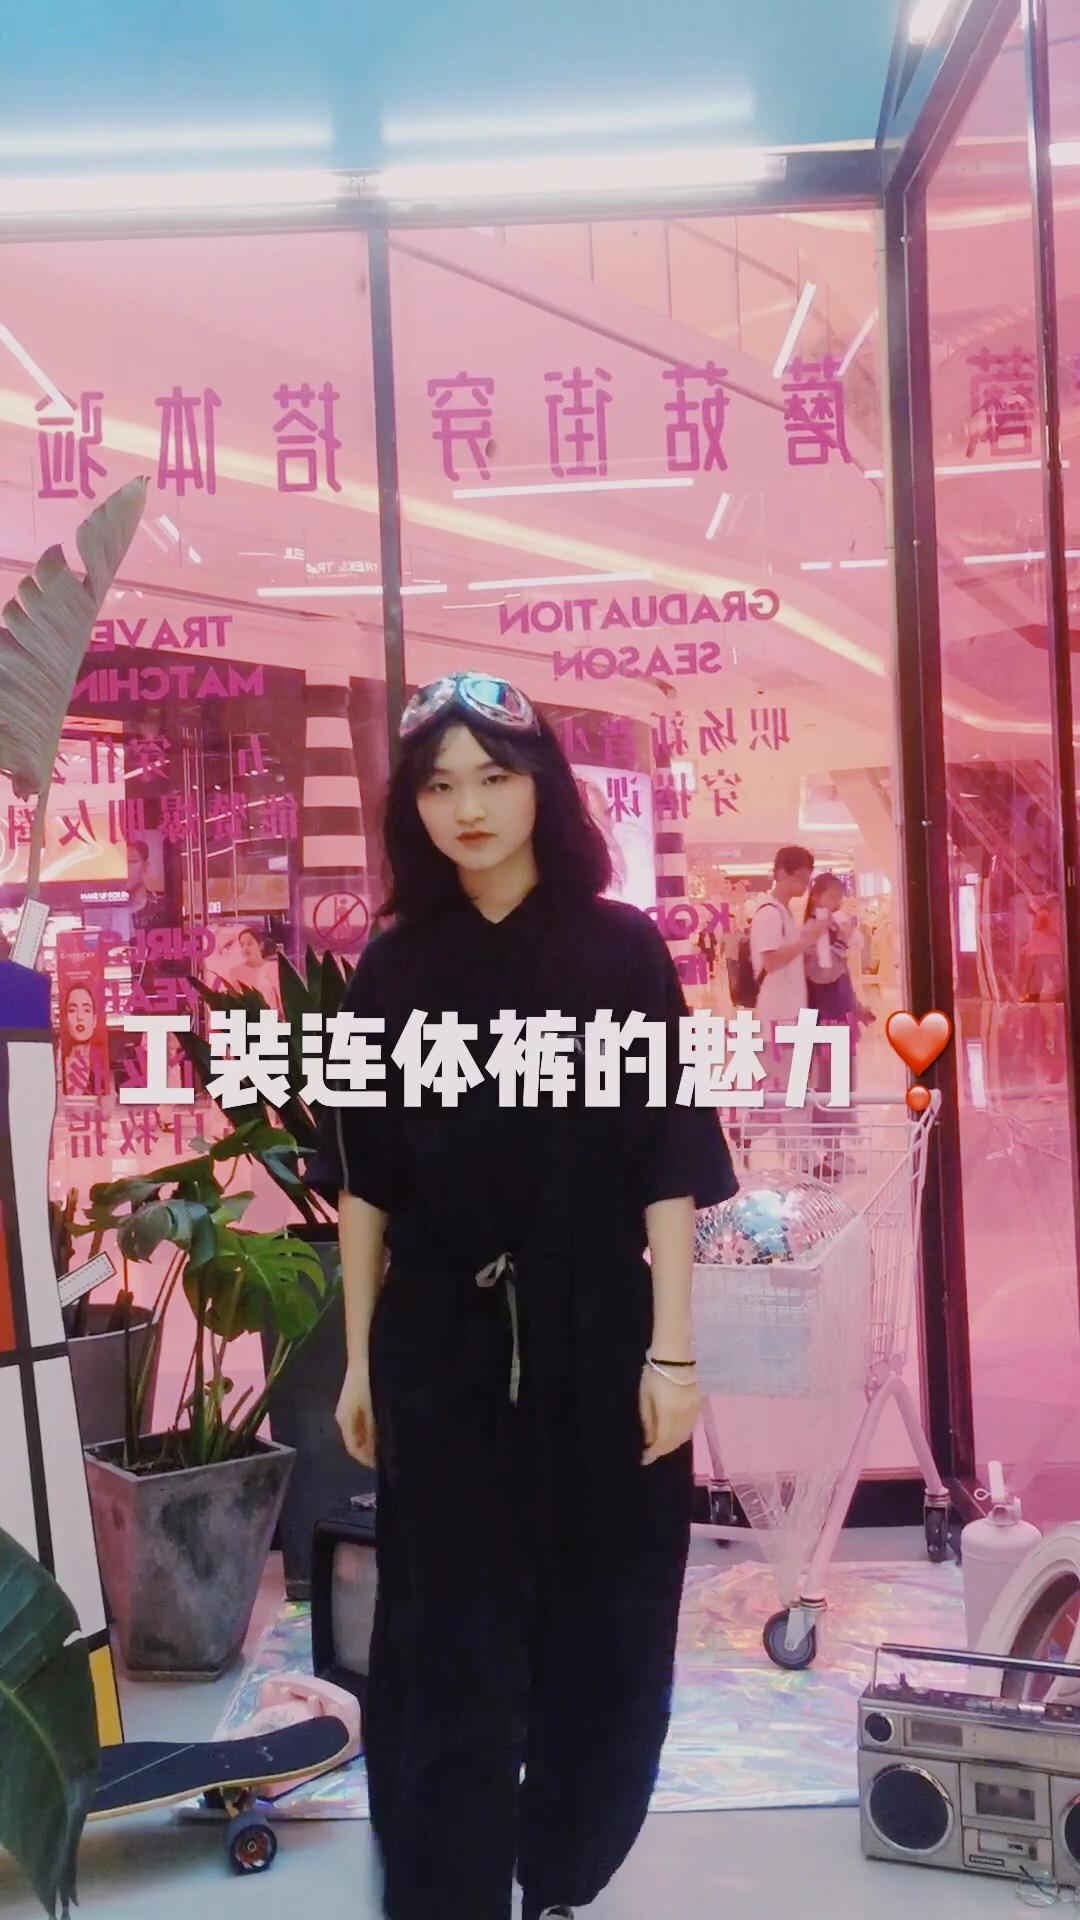 #MOGU STUDIO x 杭州大悦城 线下搭配店# 日着的连体裤太好看了叭!! 夏天穿不是一般的凉快~ 真的走路带风❣️ 设计感太强了 感觉自己就是超酷的赛车手女孩👧🏻